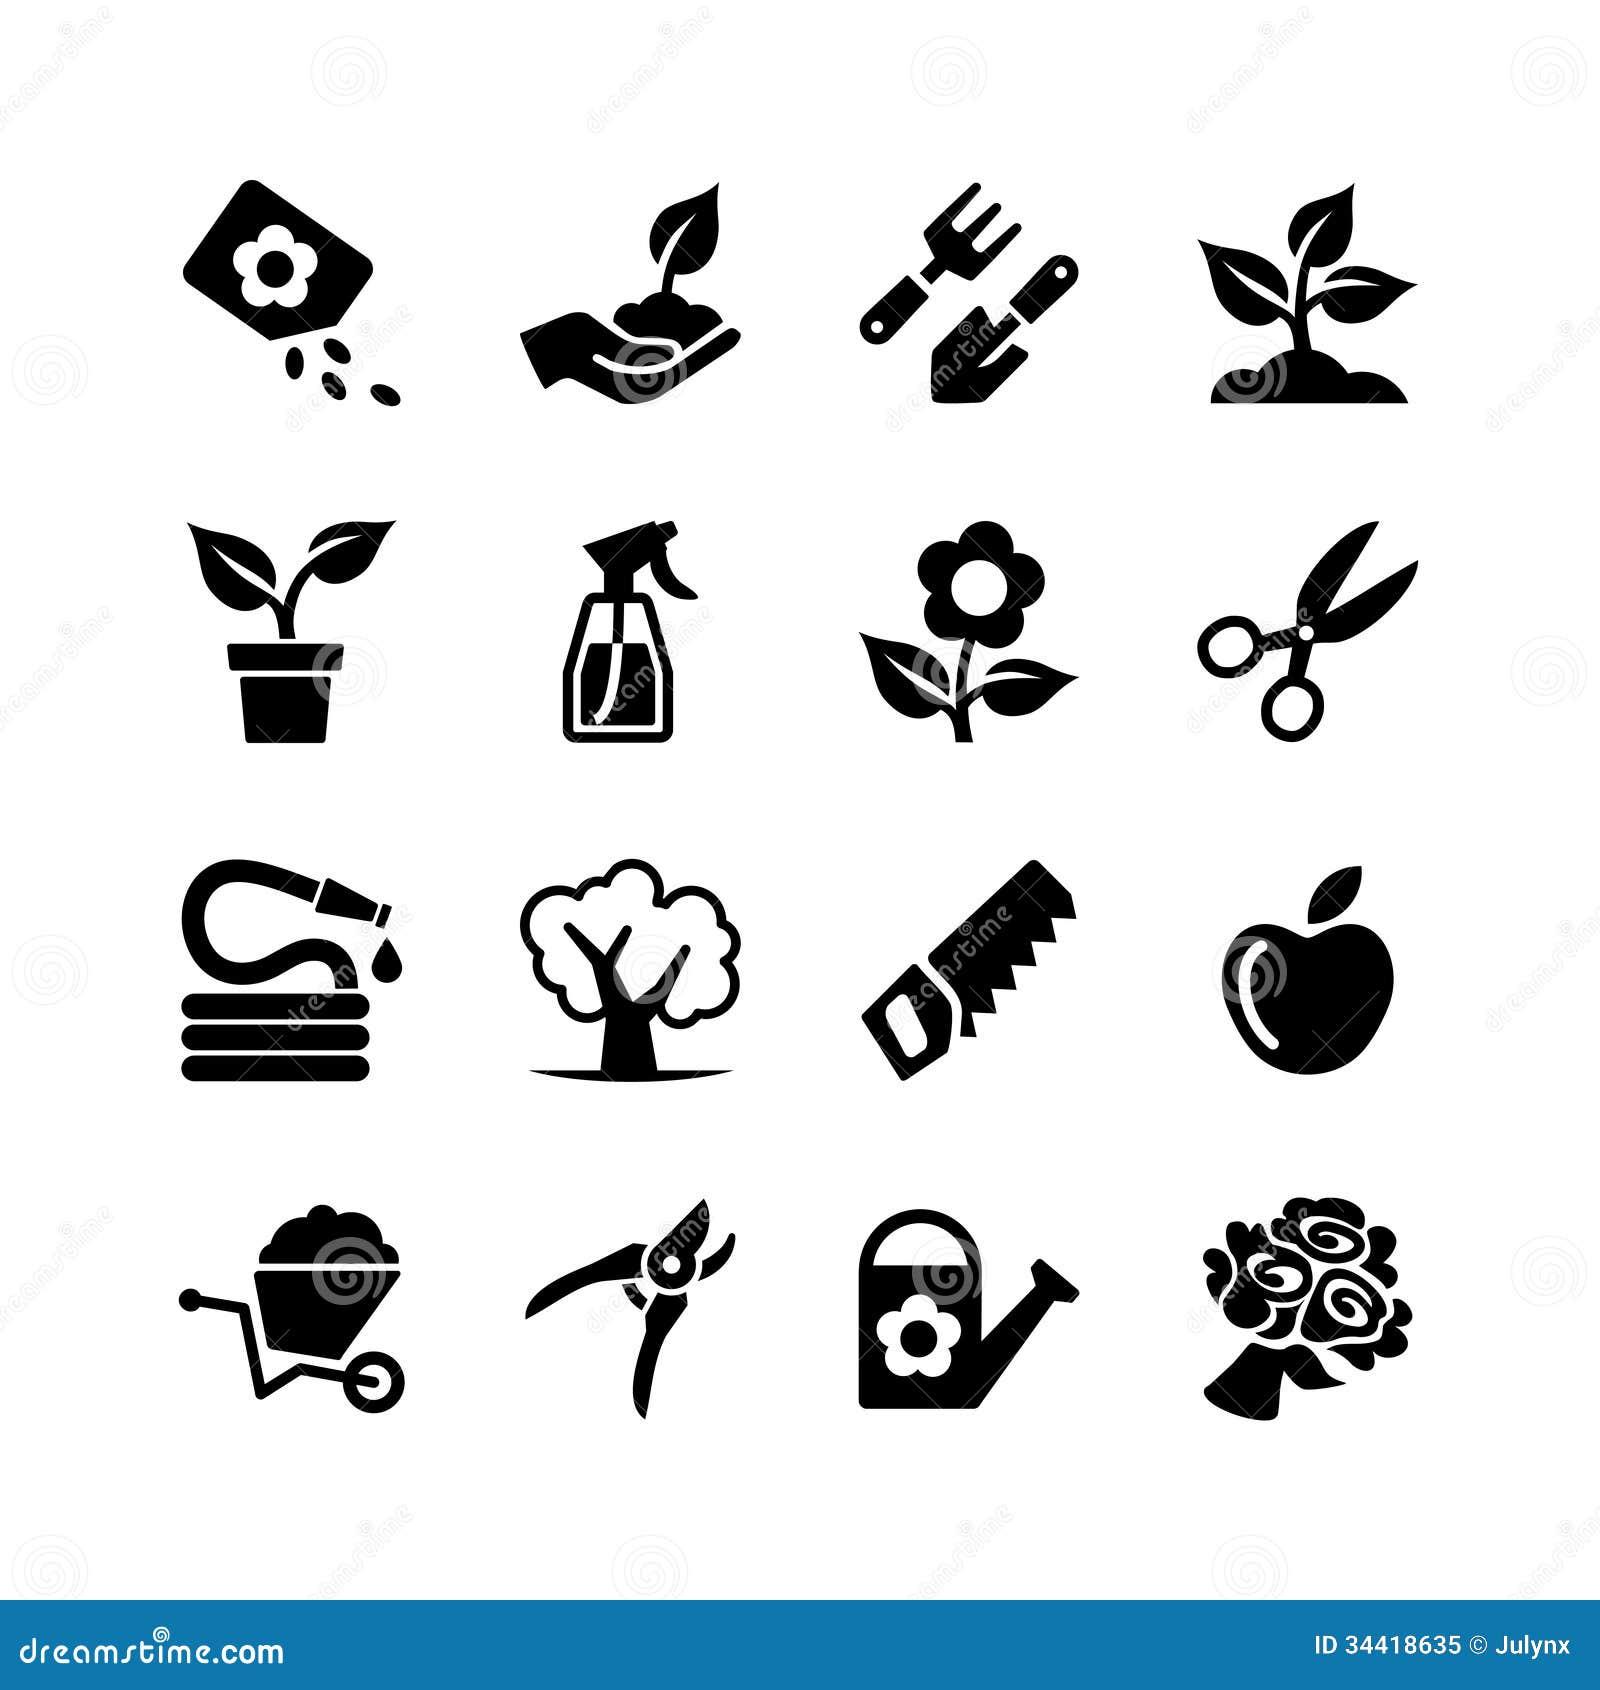 Web Icon Set Gardening Royalty Free Stock Photo - Image: 34418635: www.dreamstime.com/royalty-free-stock-photo-web-icon-set-gardening...